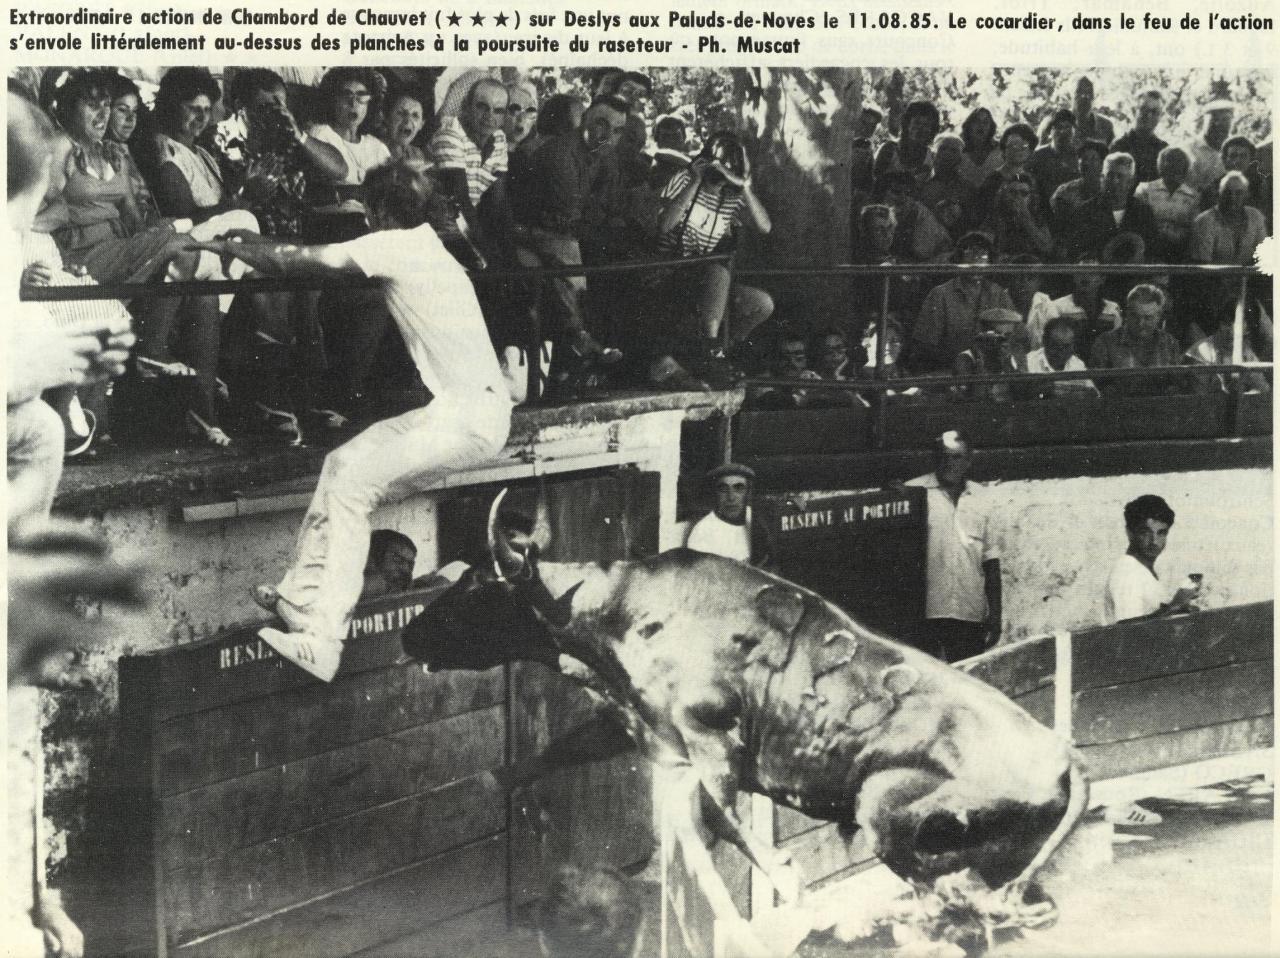 Chambord R Chauvet F Deslys 11 08 1985